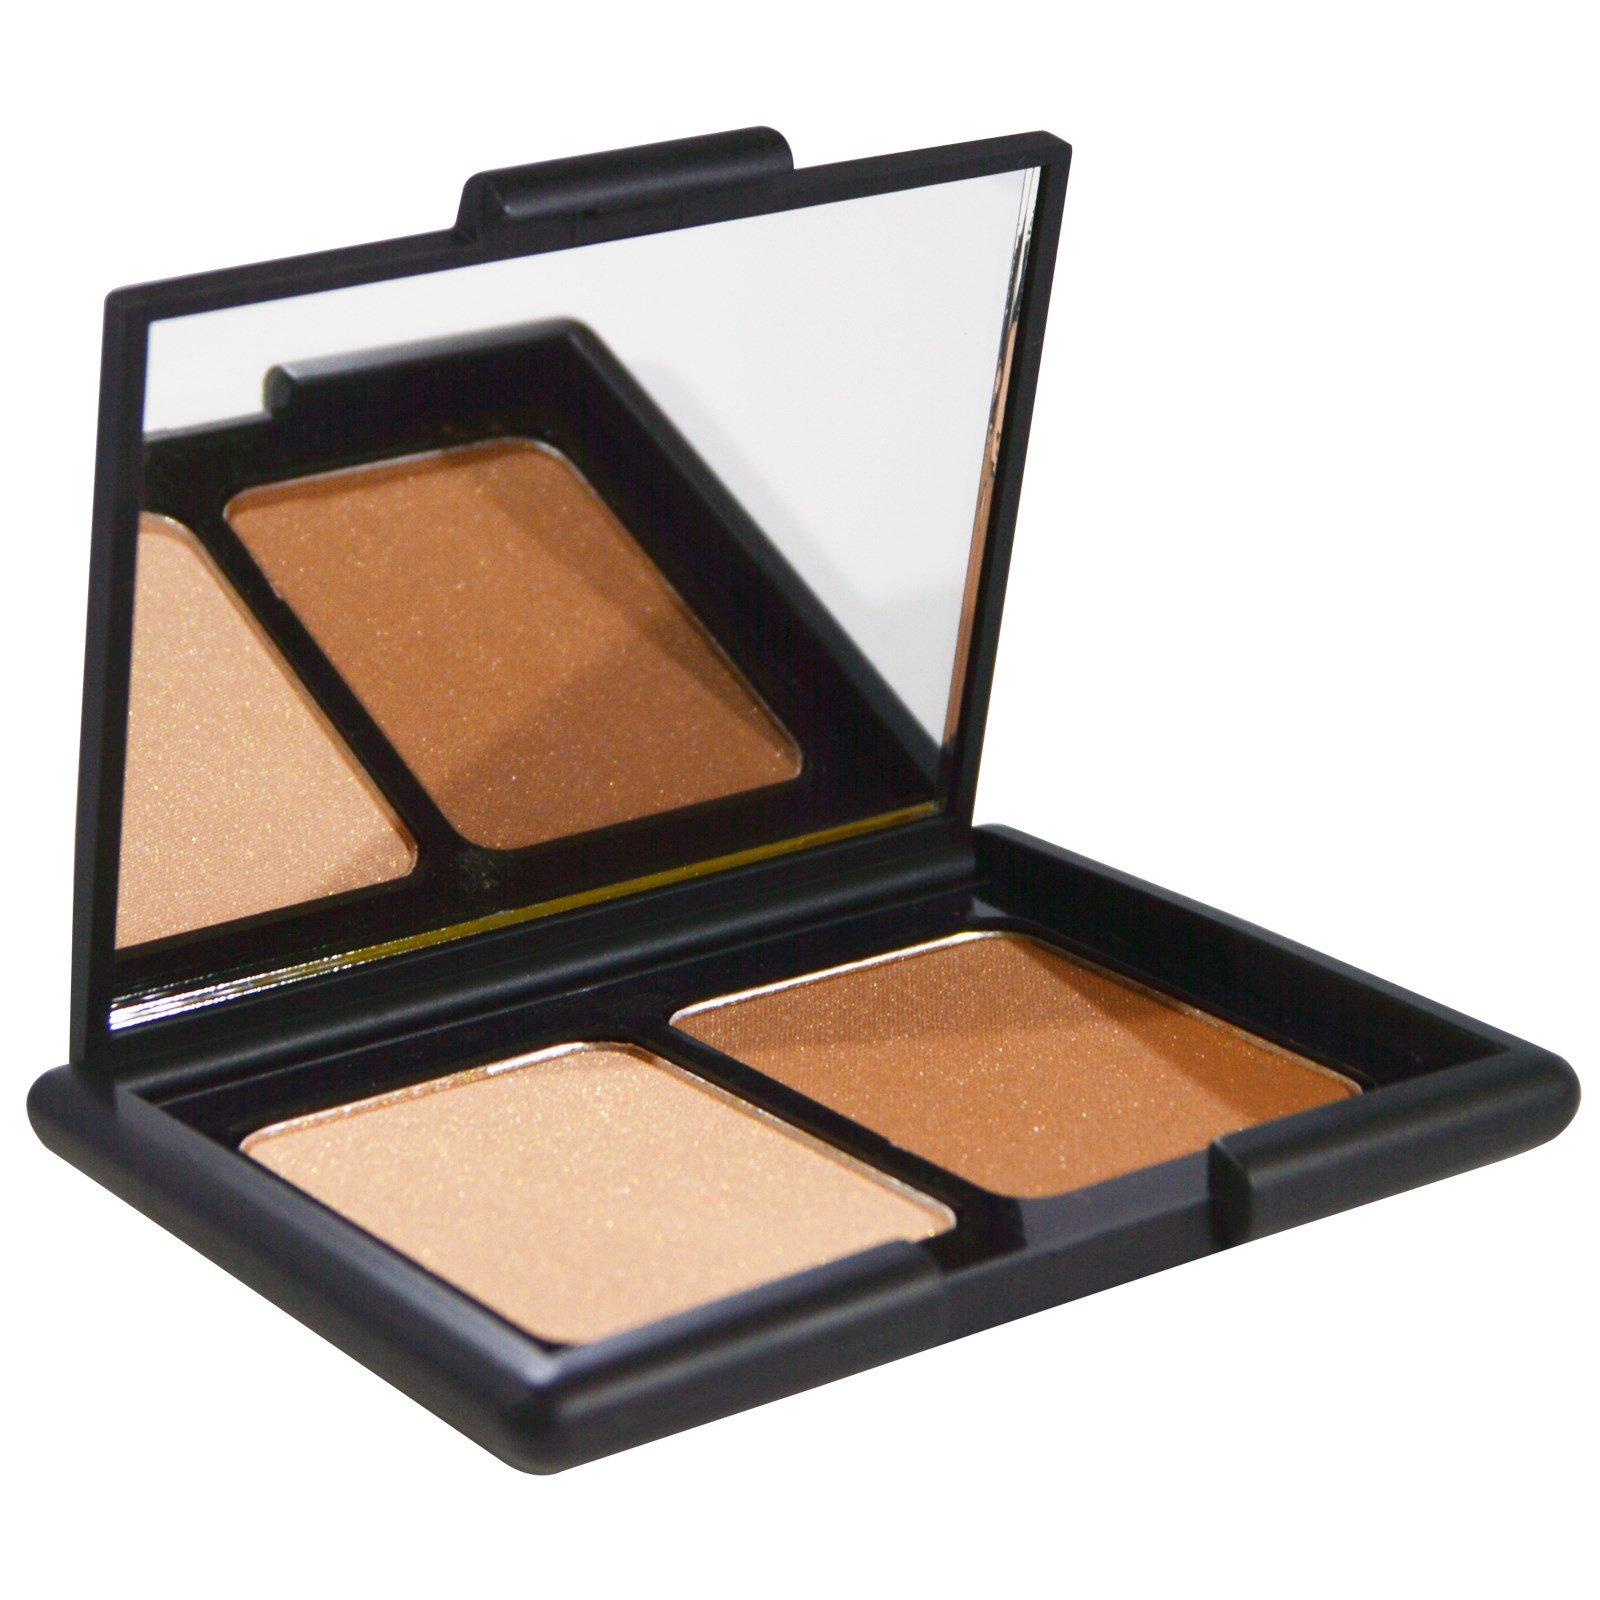 E.L.F. Cosmetics, Contouring Blush & Bronzing Powder, Turks & Caicos, 0.30 oz (pack of 1)